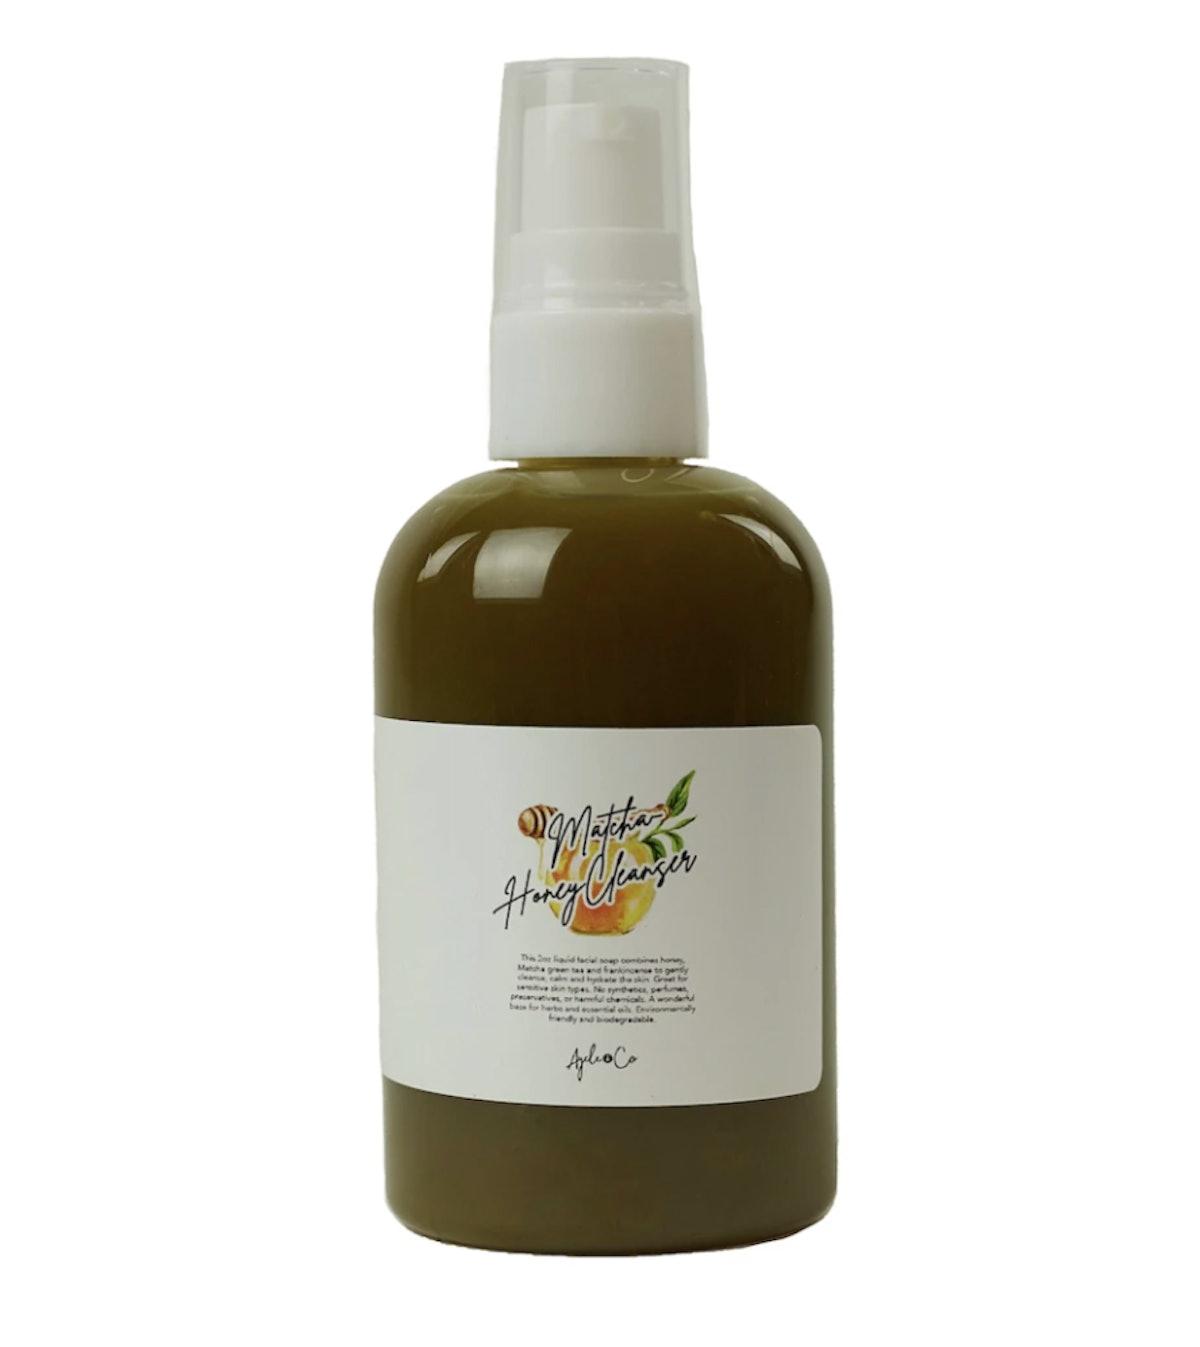 Matcha Honey Cleanser